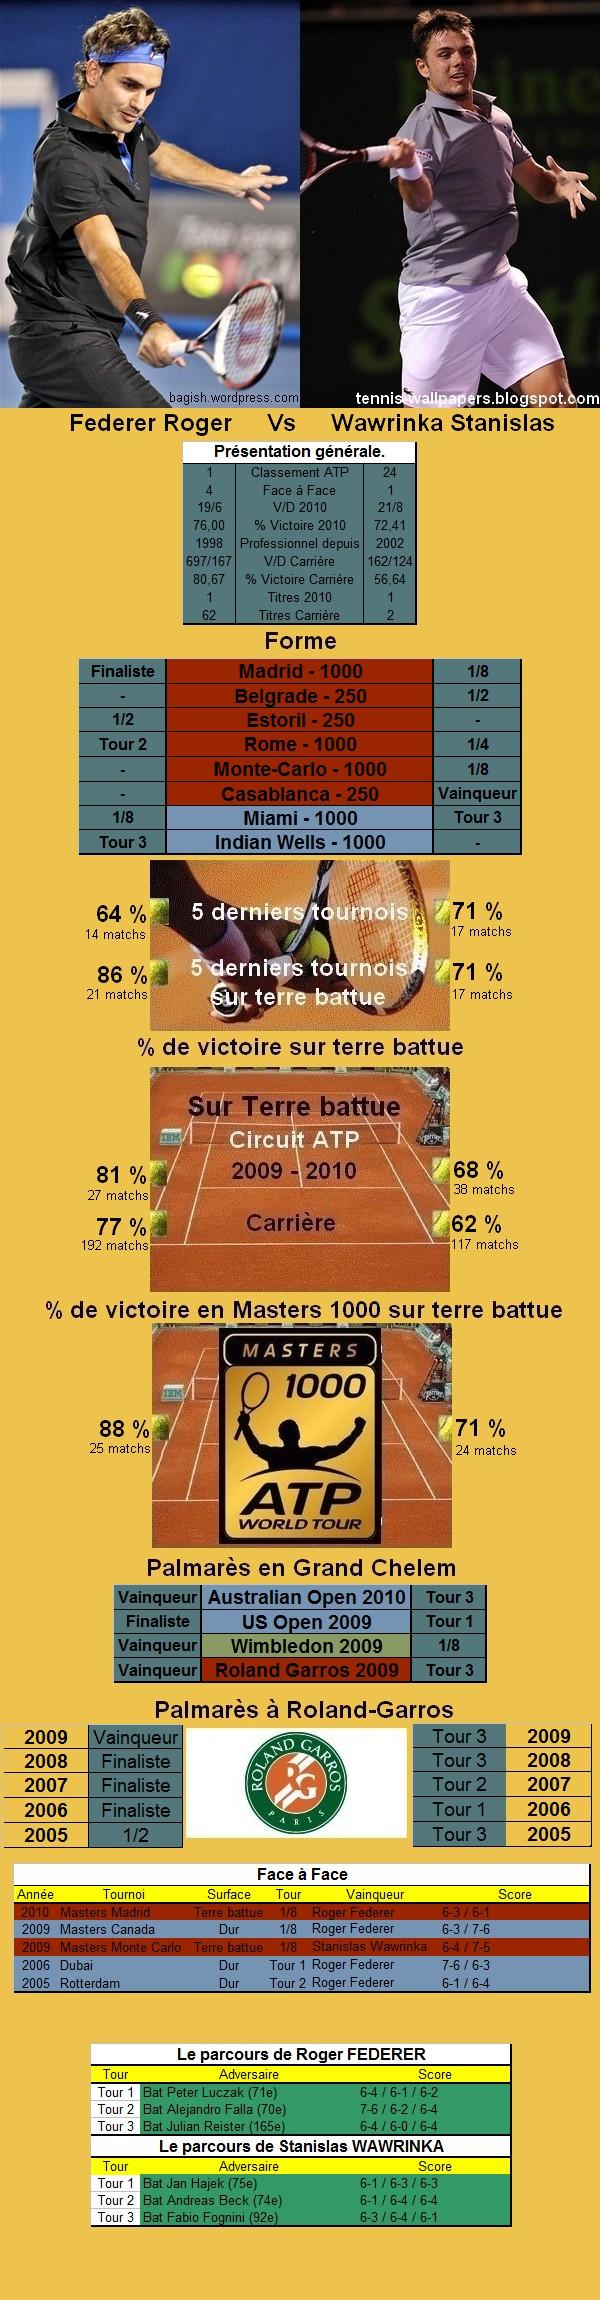 Statistiques tennis de Federer contre Wawrinka à Roland Garros